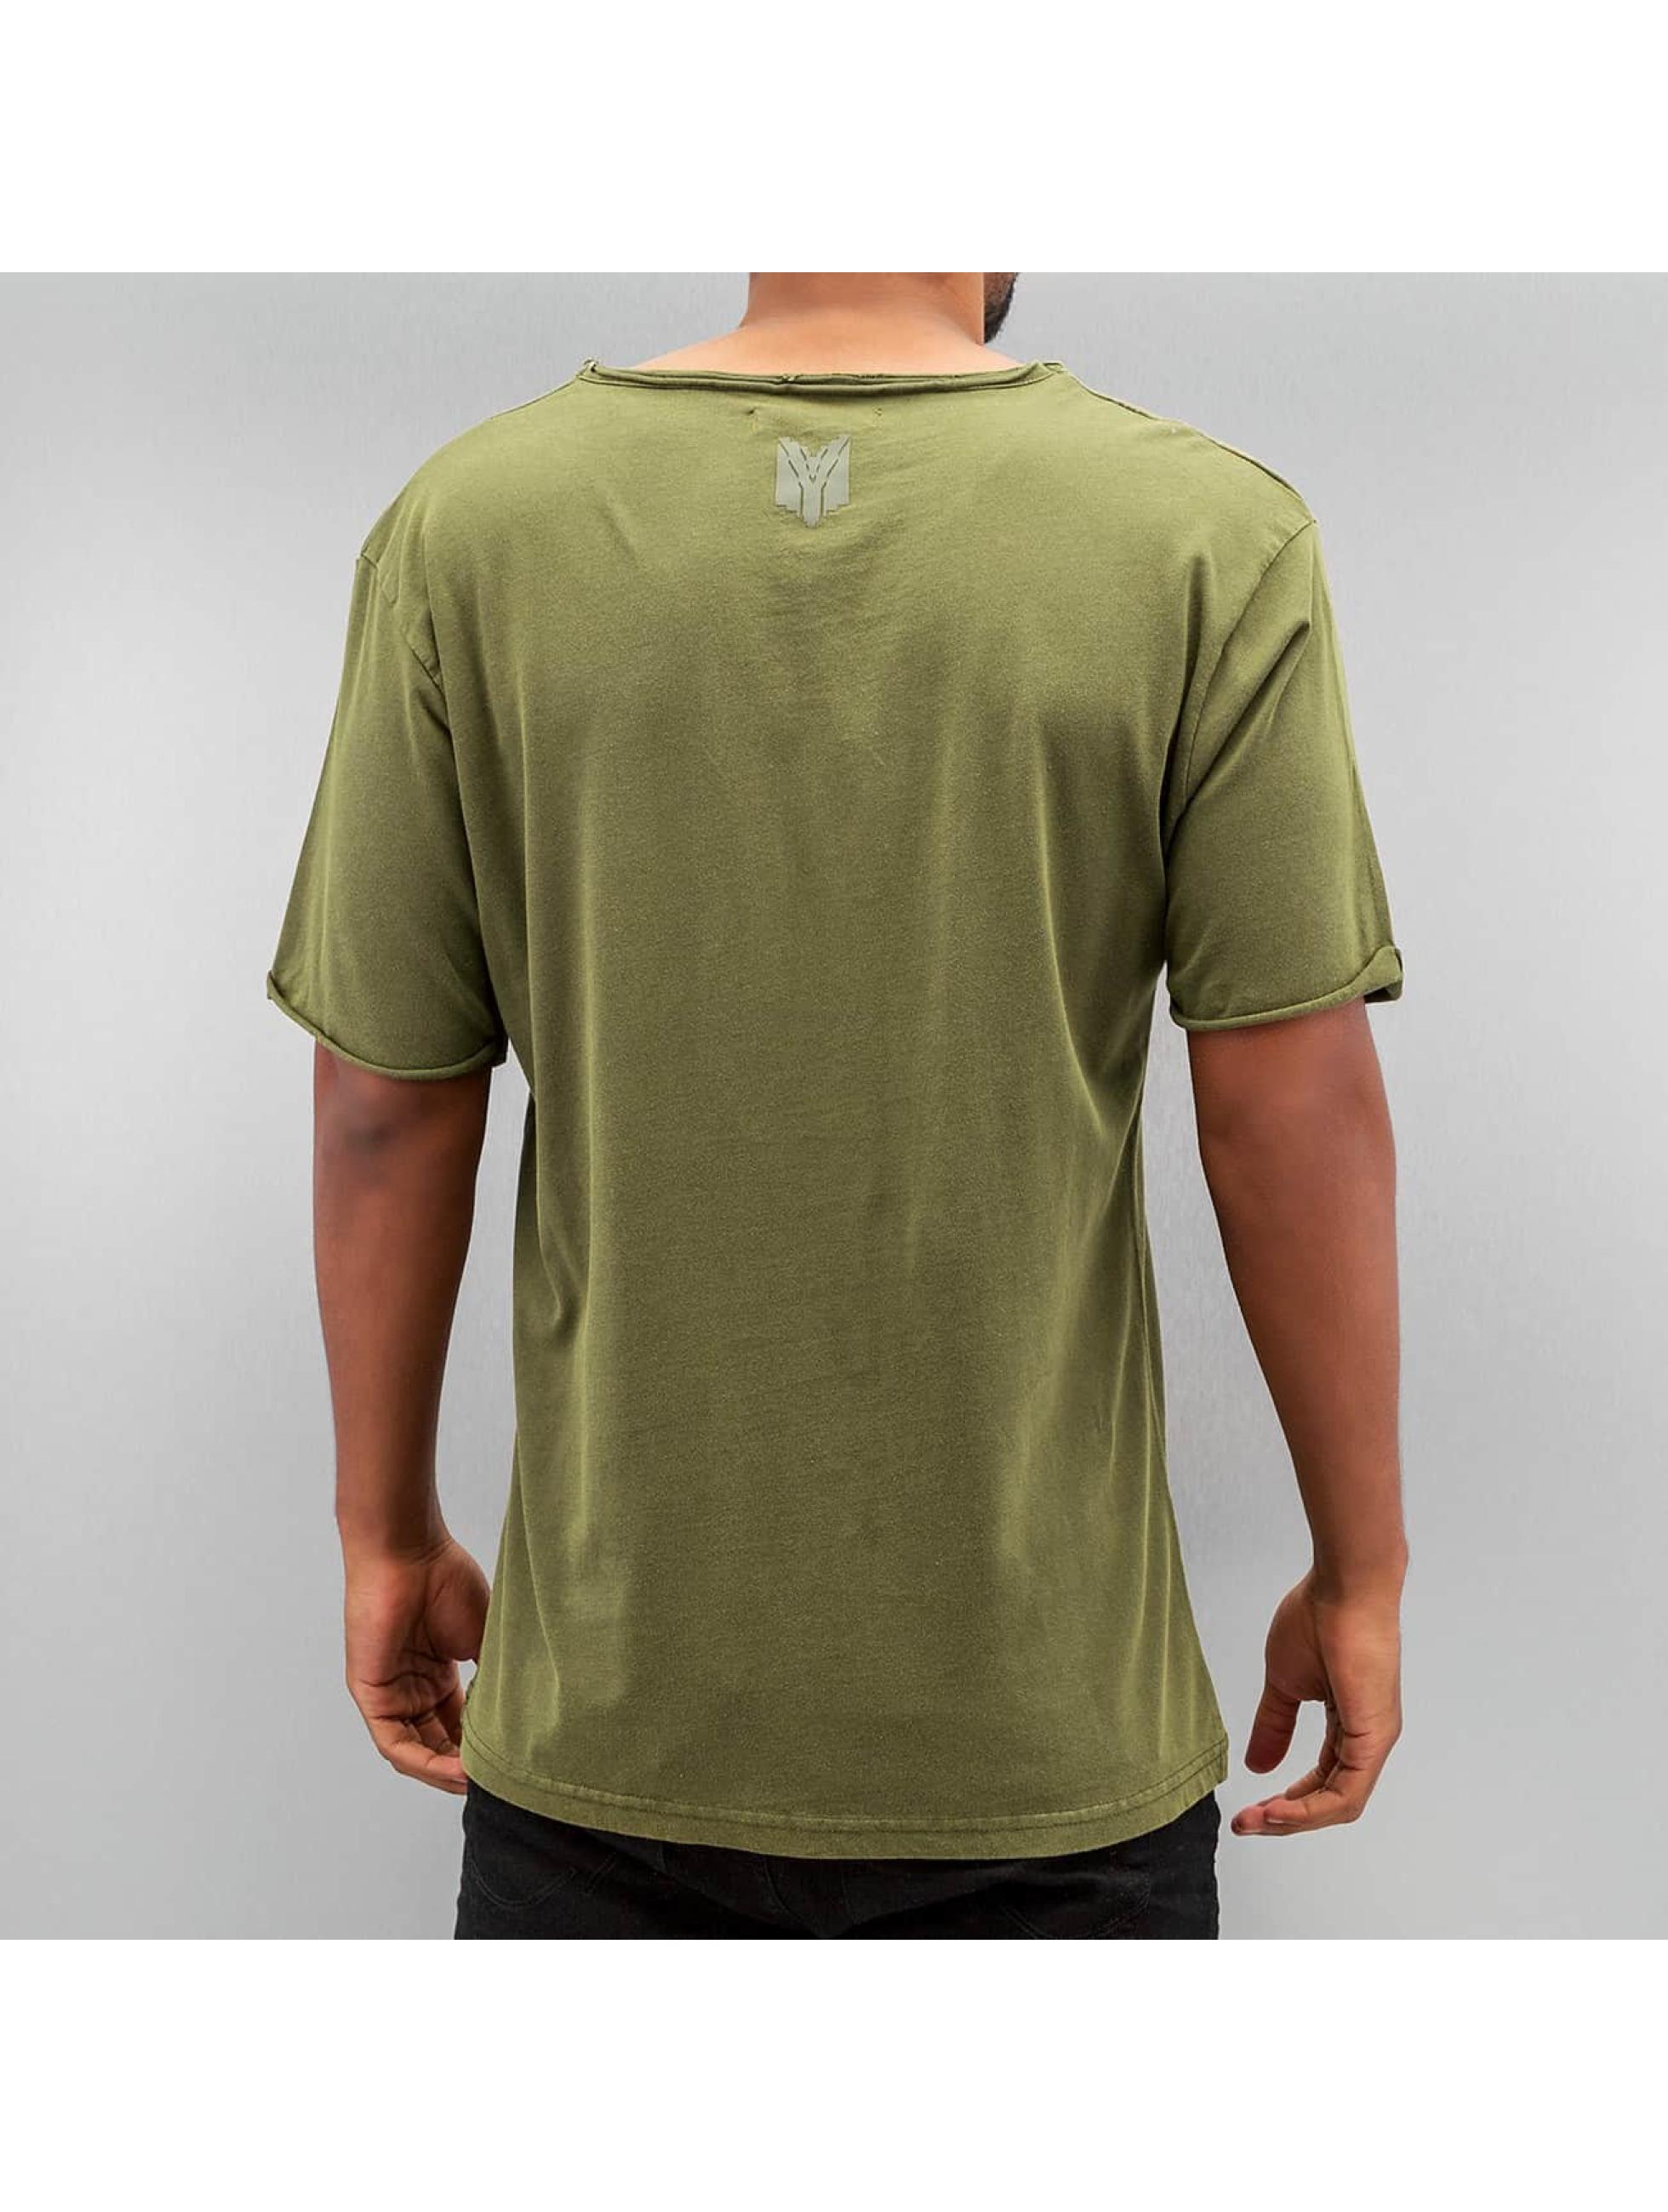 Yezz Футболка Tion зеленый